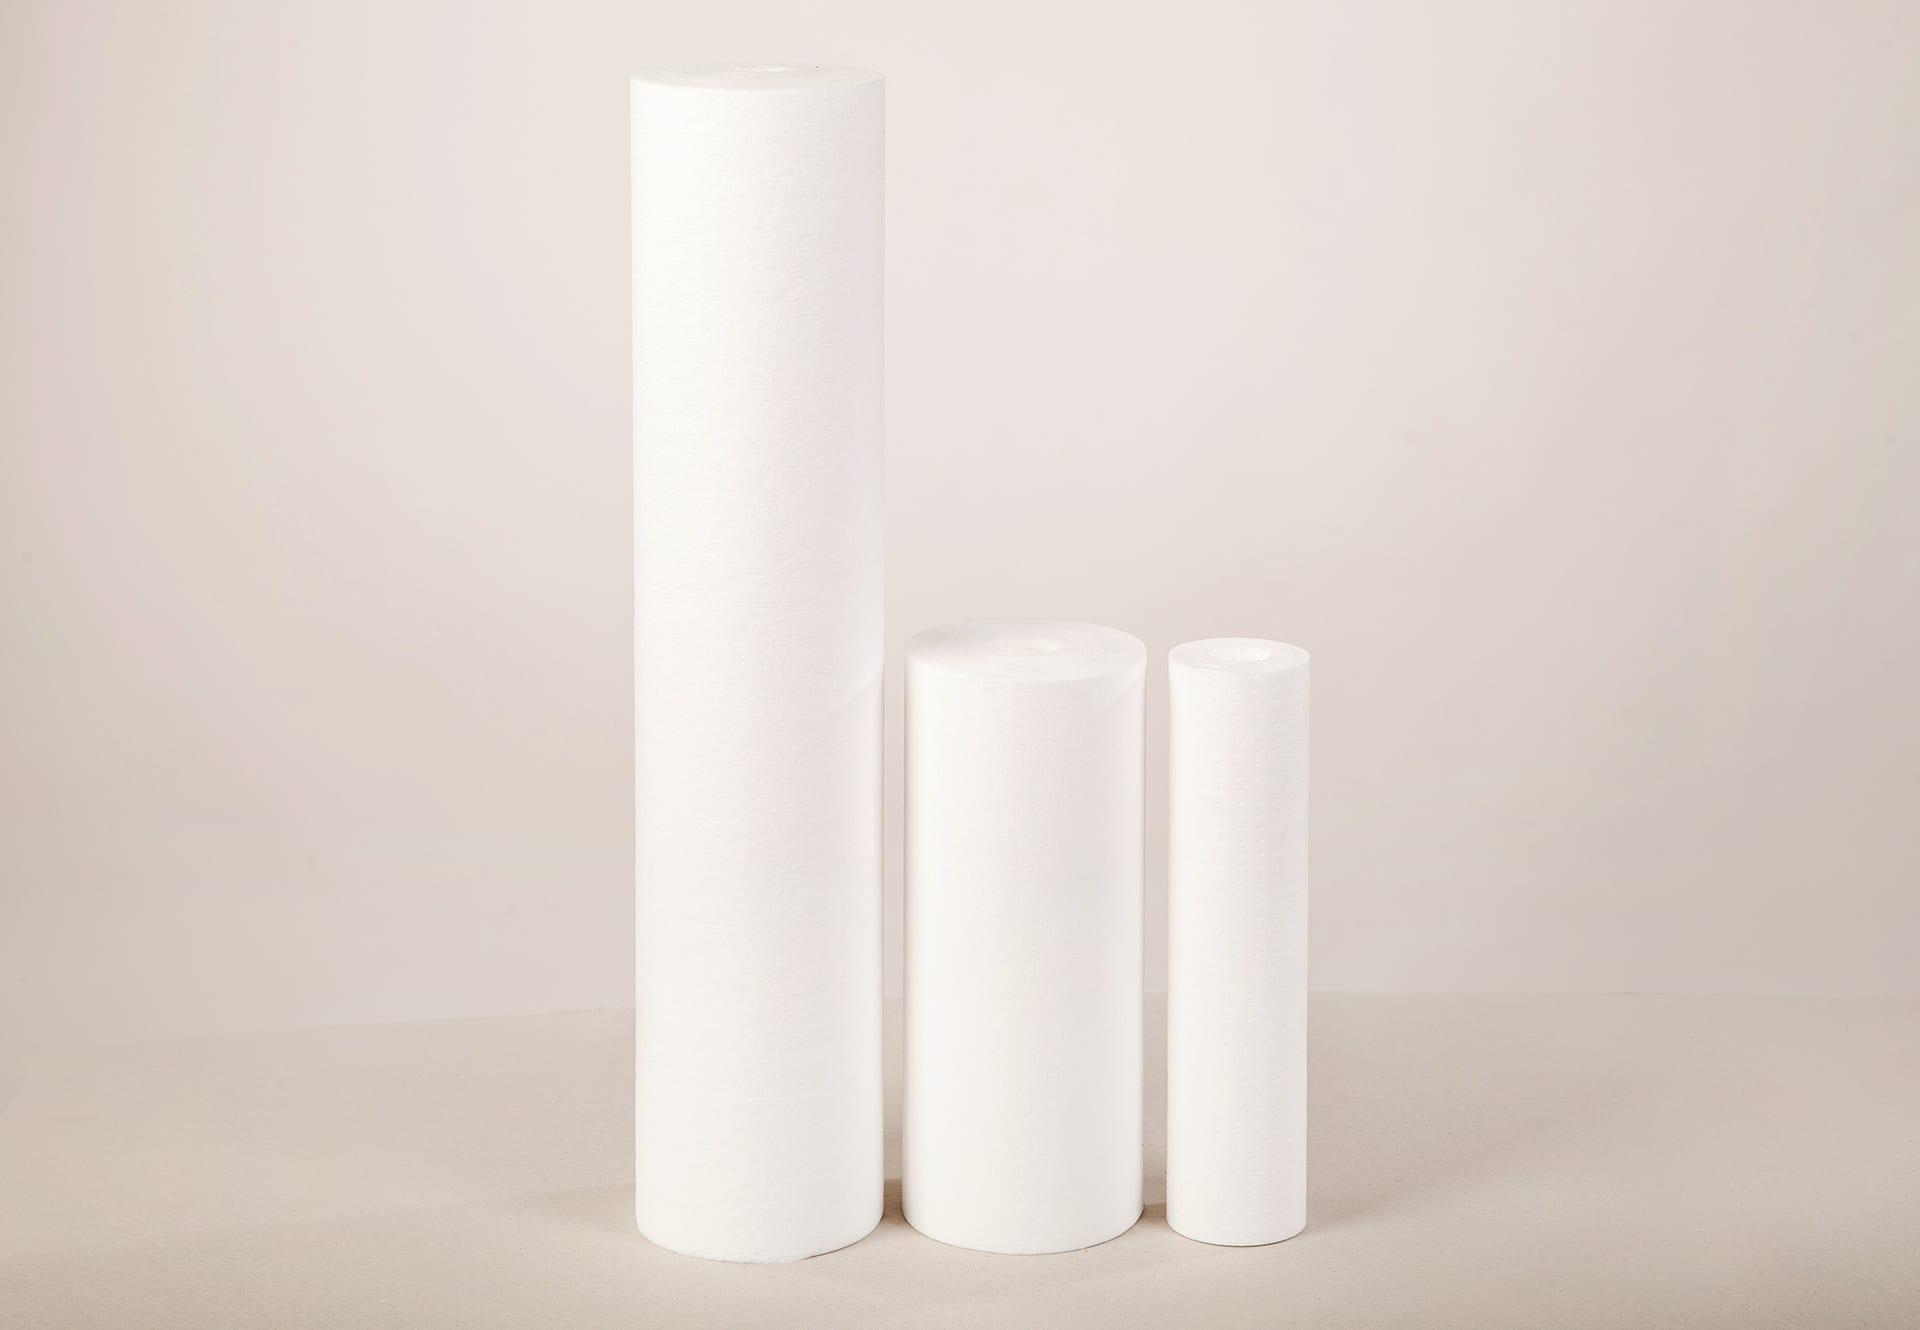 mehāniskais ūdens filts balts